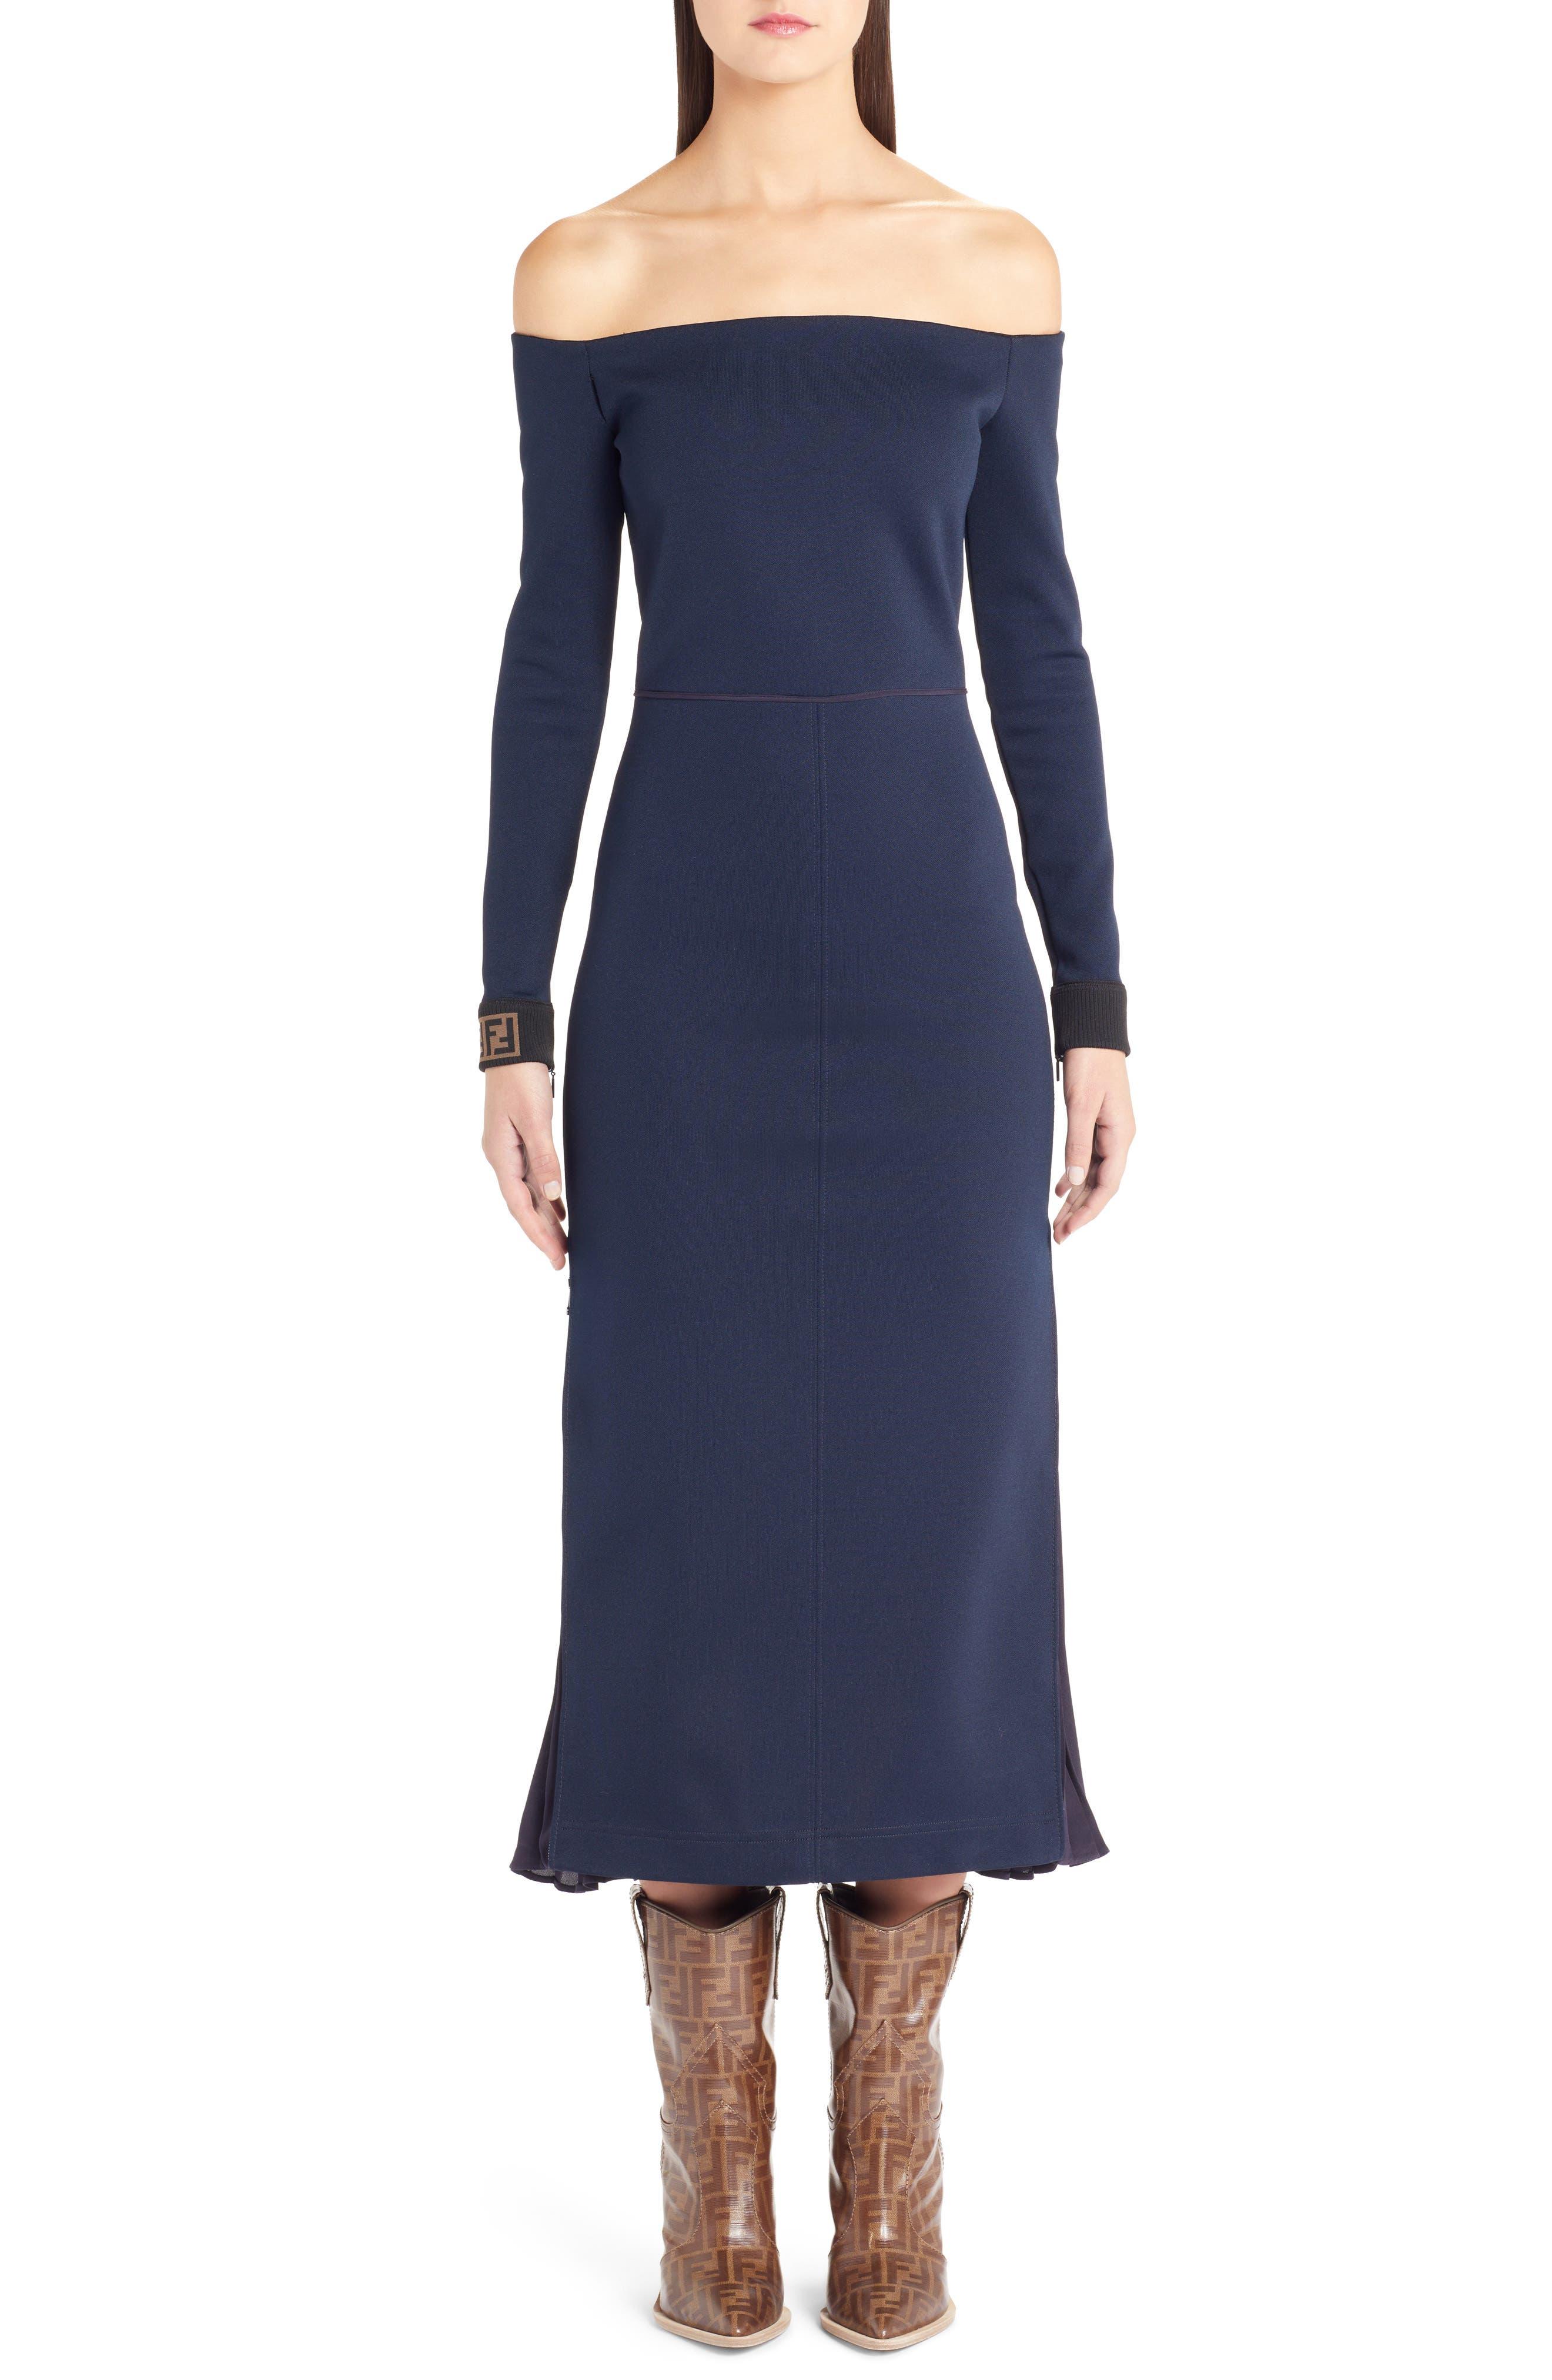 Fendi Logo Cuff Off The Shoulder Midi Dress, 8 IT - Blue